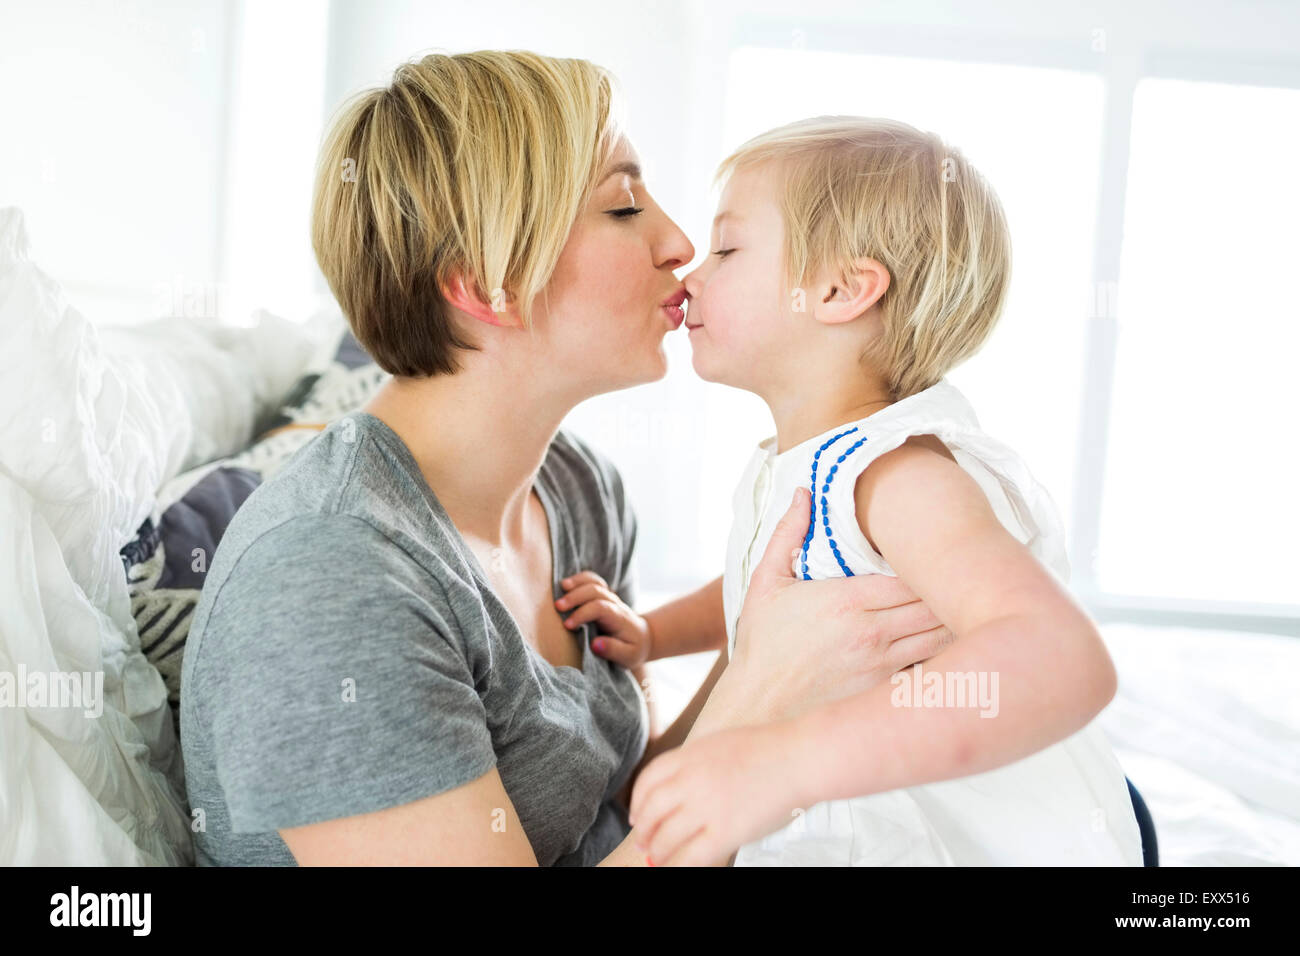 Woman kissing girl (2-3) in bedroom Stock Photo